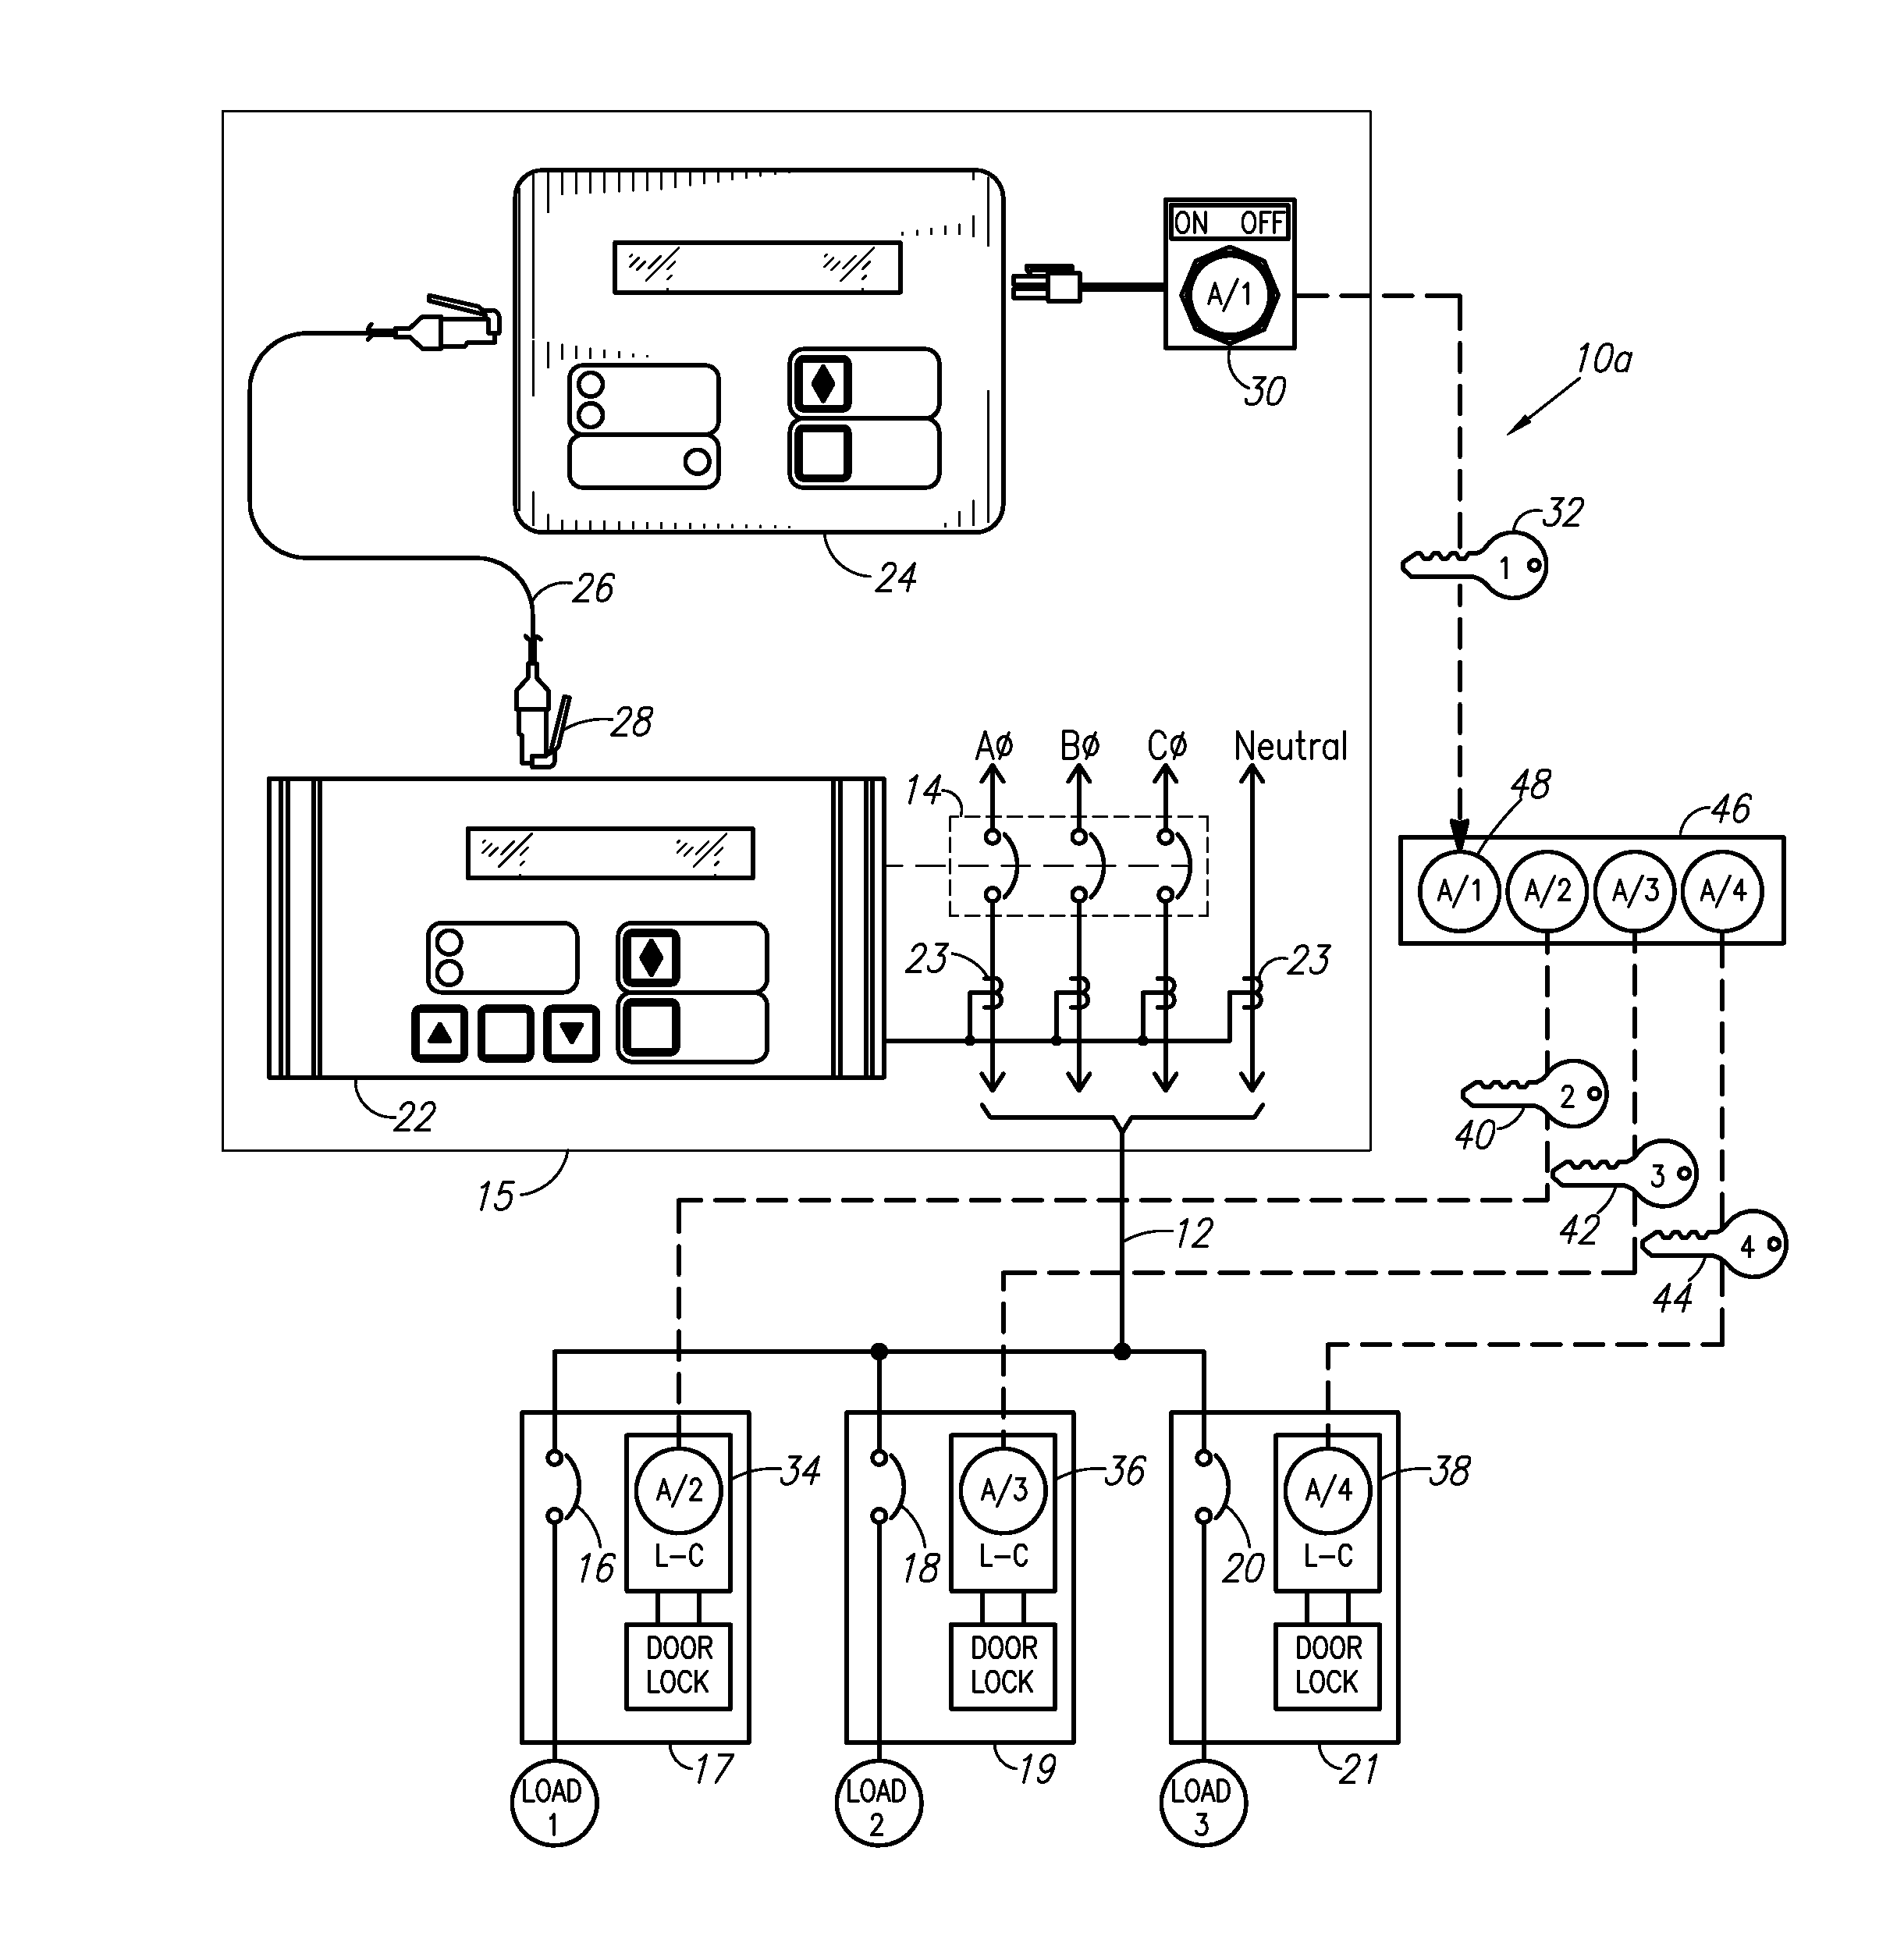 1999 saturn sl2 ignition wiring diagram 2008 hyundai santa fe stereo 1996 fuse box imageresizertool com